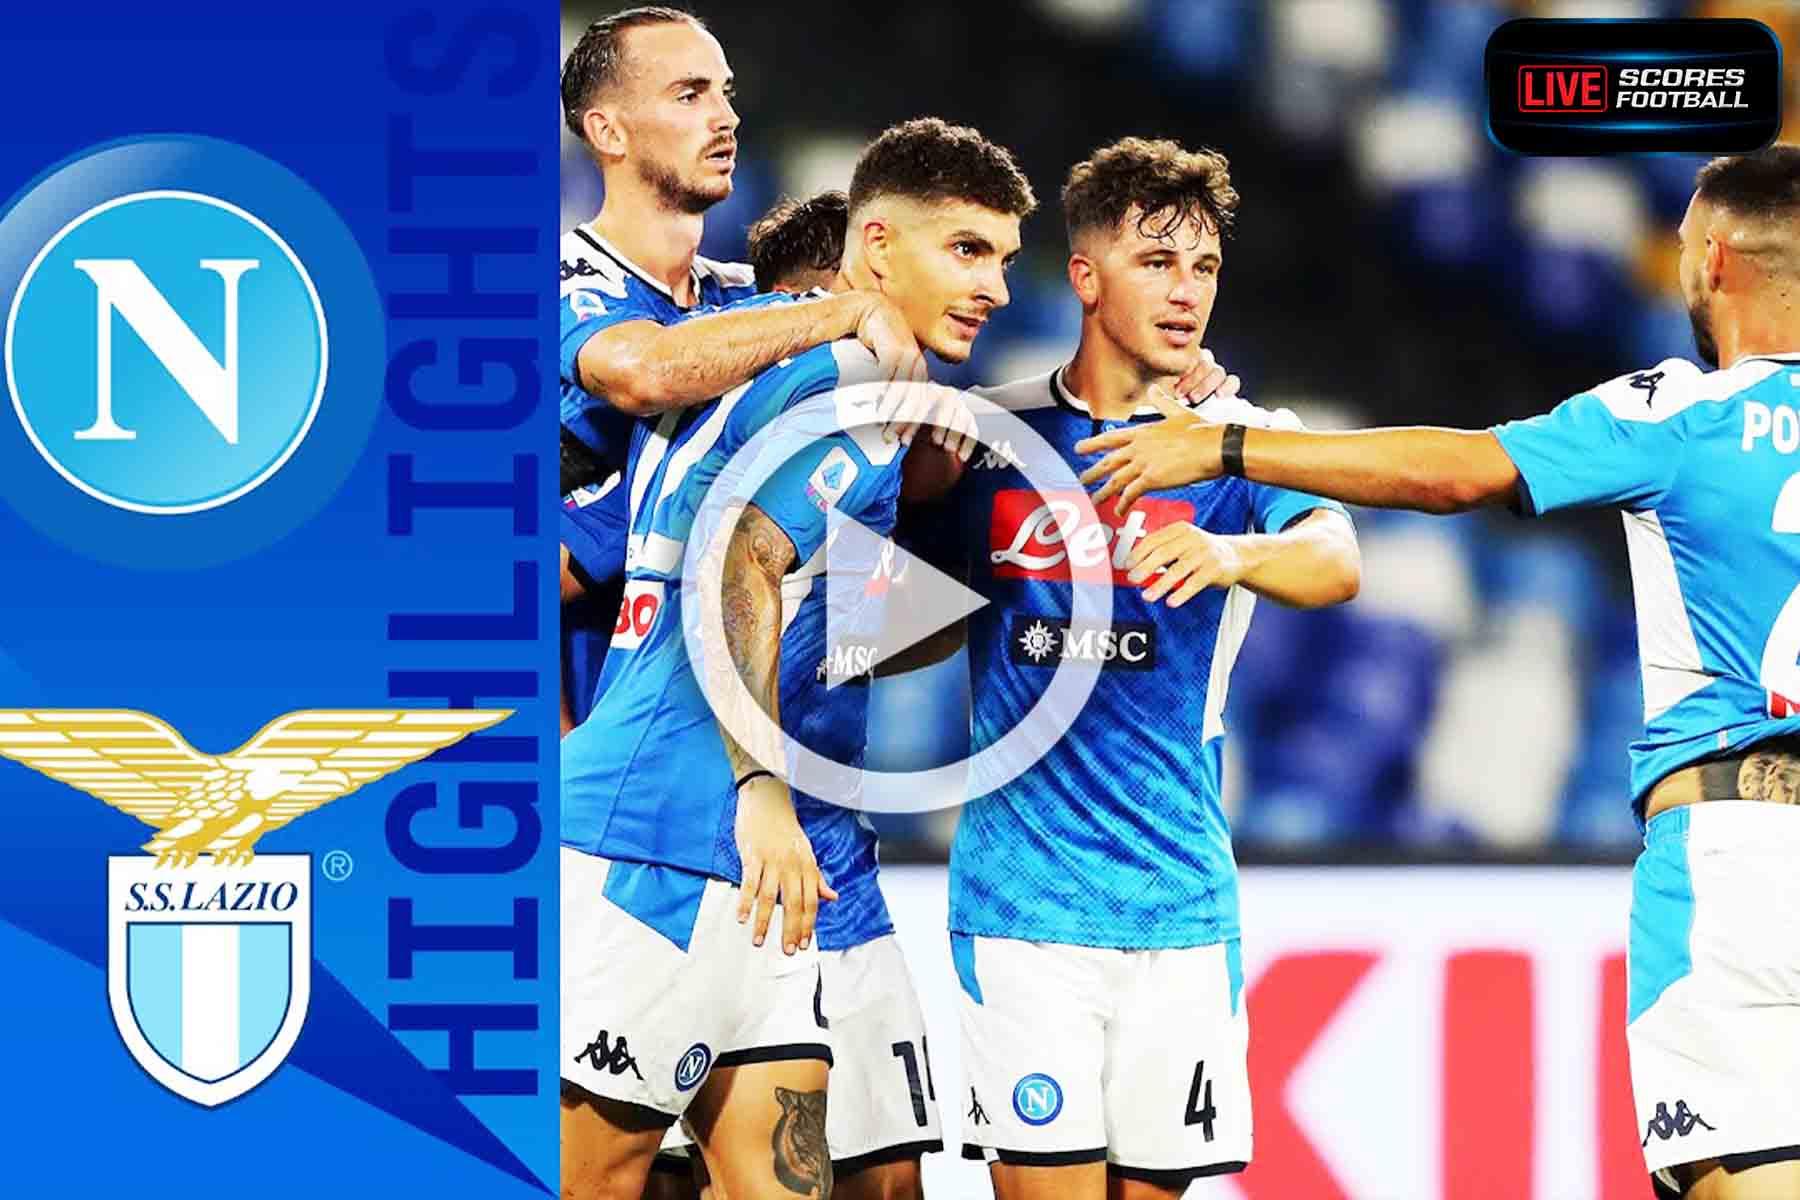 Read more about the article ไฮไลท์คู่เด็ด รวมลีกดังยุโรป(กัลโช่ ซีรีย์ อา)อิตาลี นาโปลี 3-1 ลาซิโอ วันที่ 1-8-2020